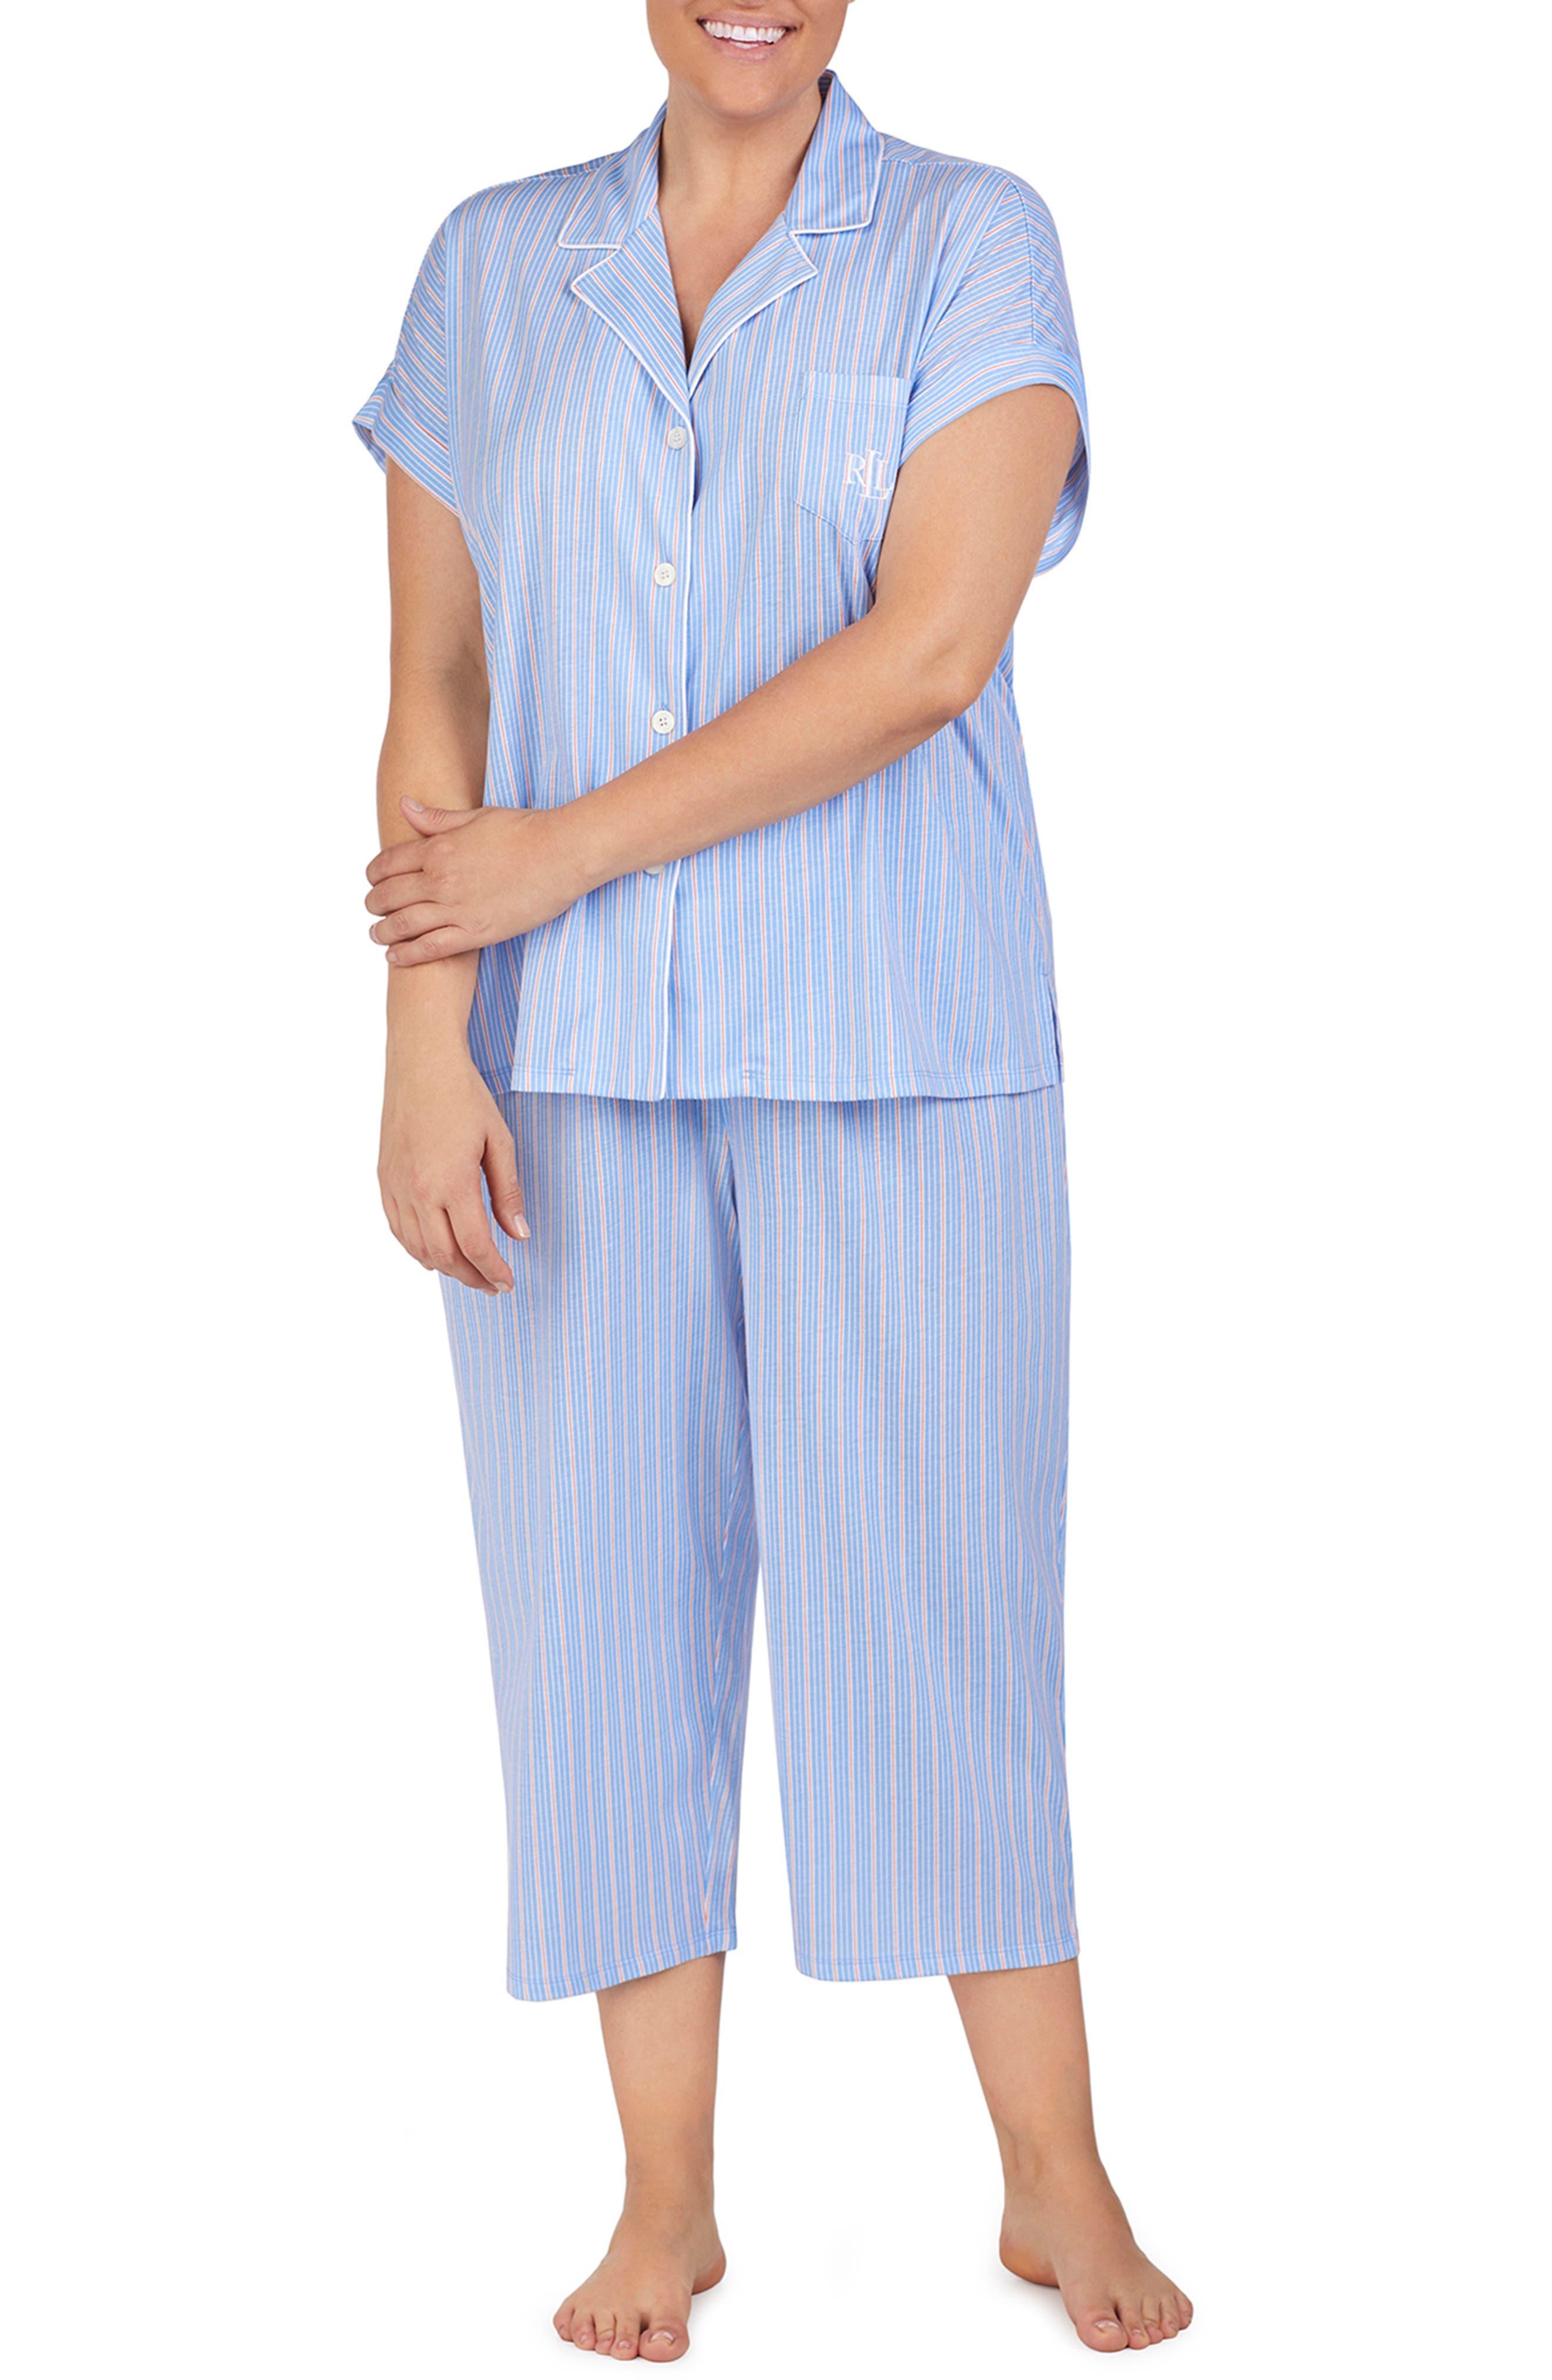 LAUREN RALPH LAUREN, Capri Pajamas, Alternate thumbnail 2, color, BLUE STRIPE